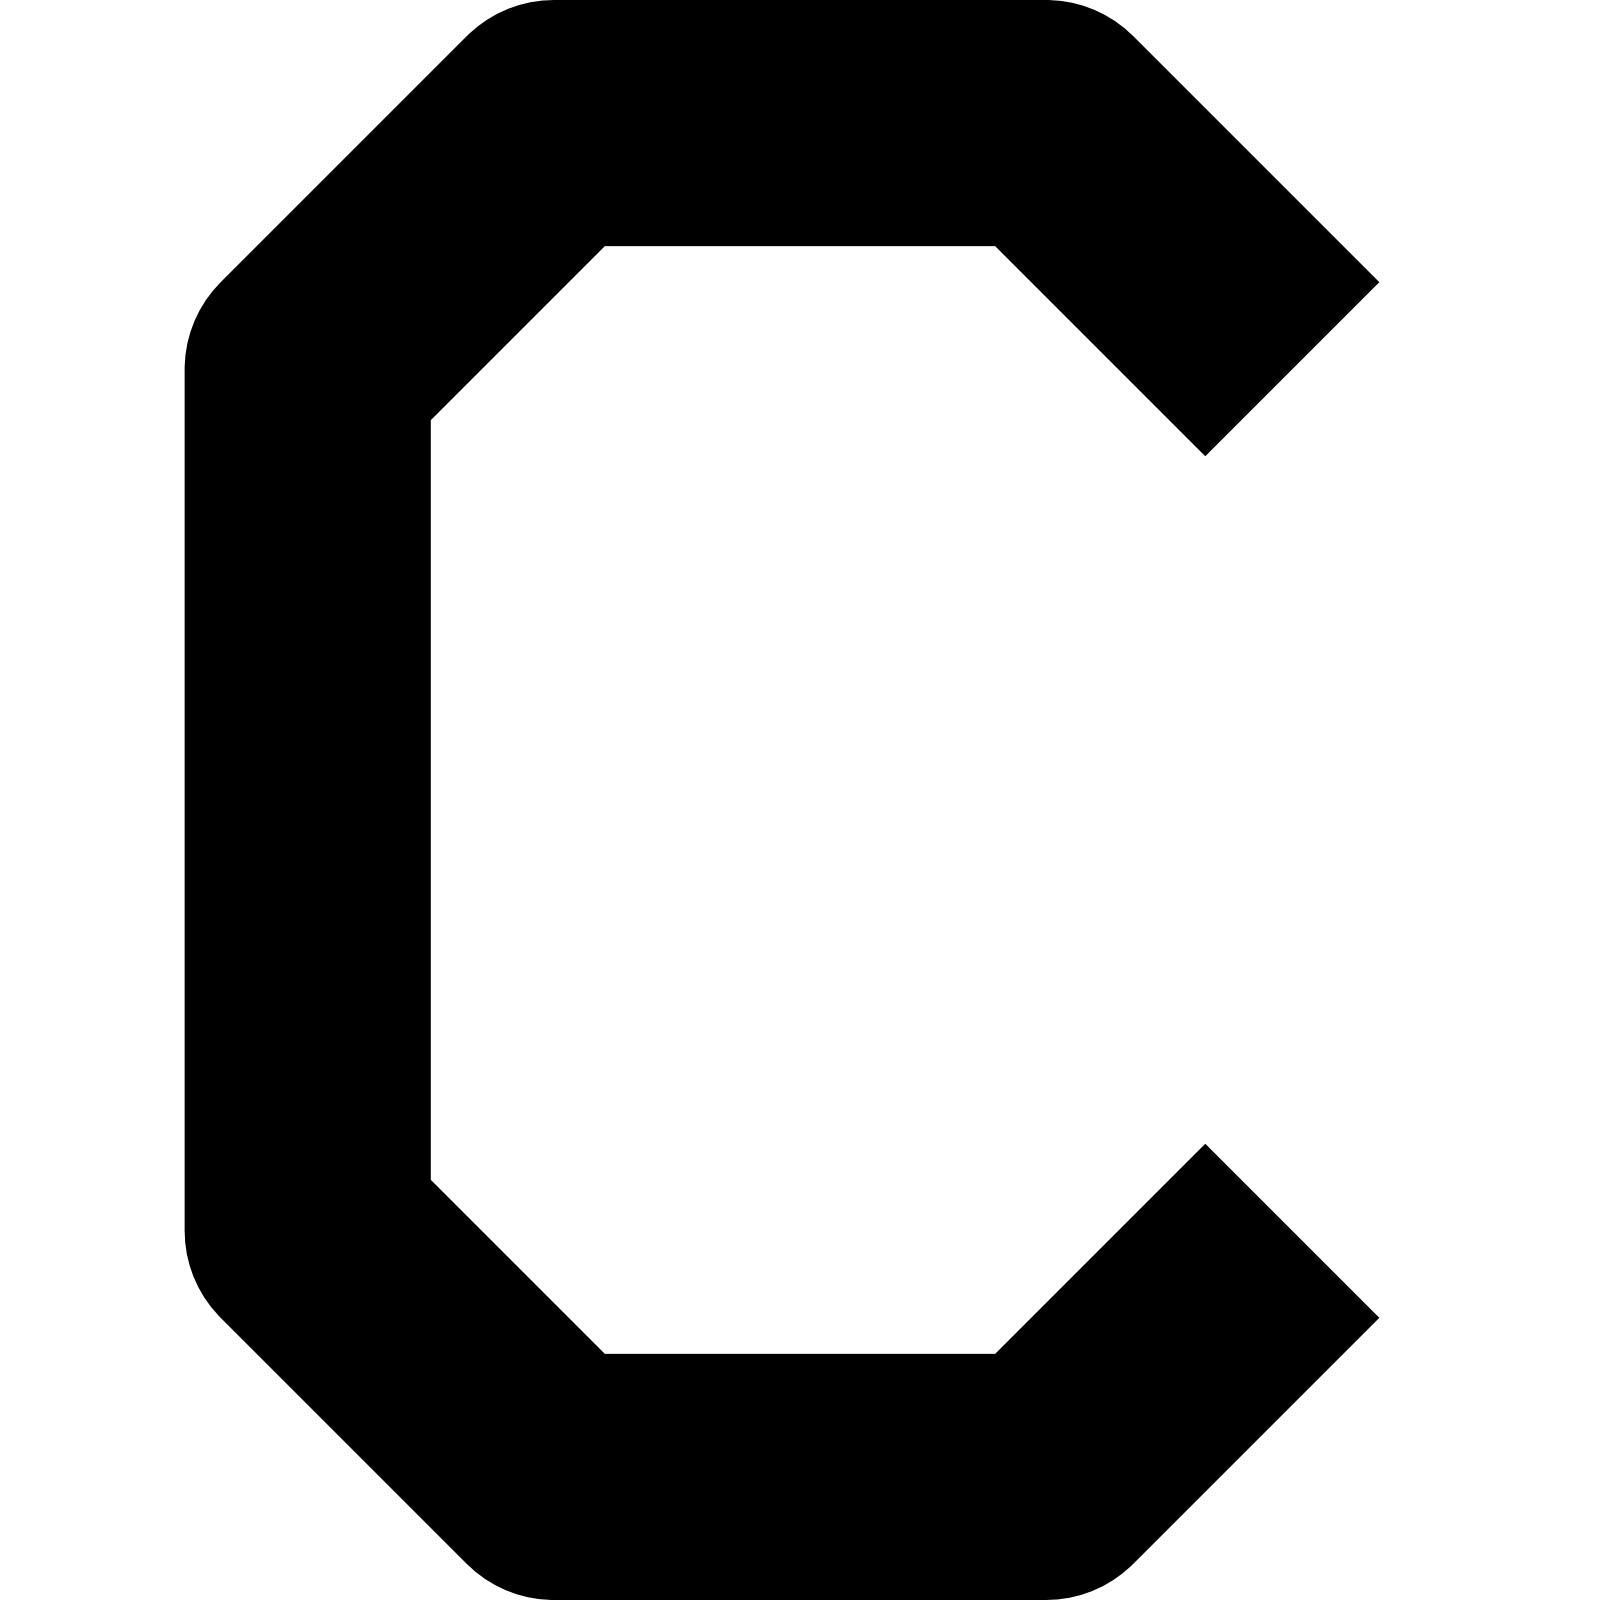 Letter C Png - C, Transparent background PNG HD thumbnail